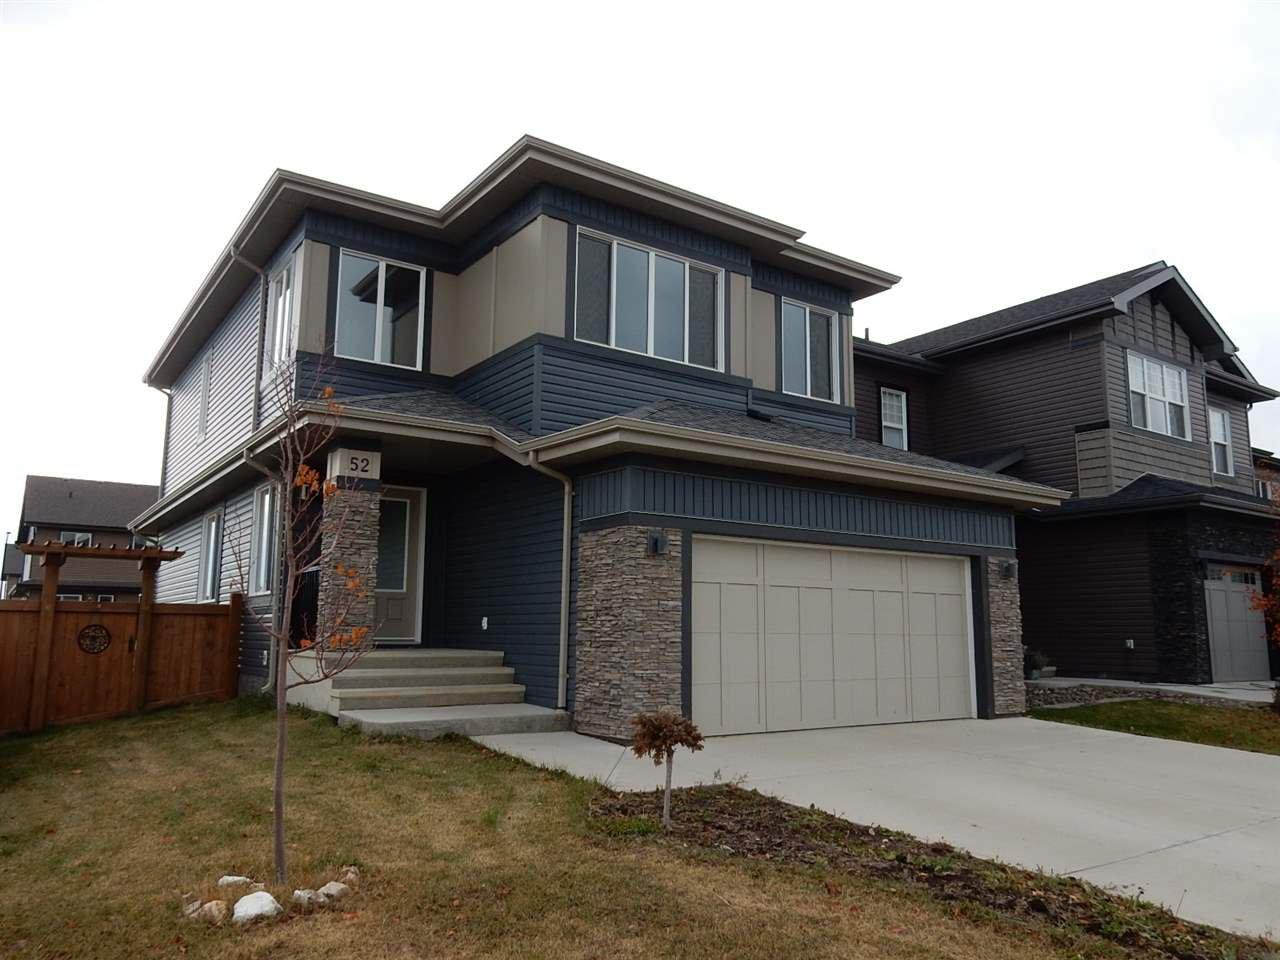 Main Photo: 52 Prescott Close: Spruce Grove House for sale : MLS®# E4180403